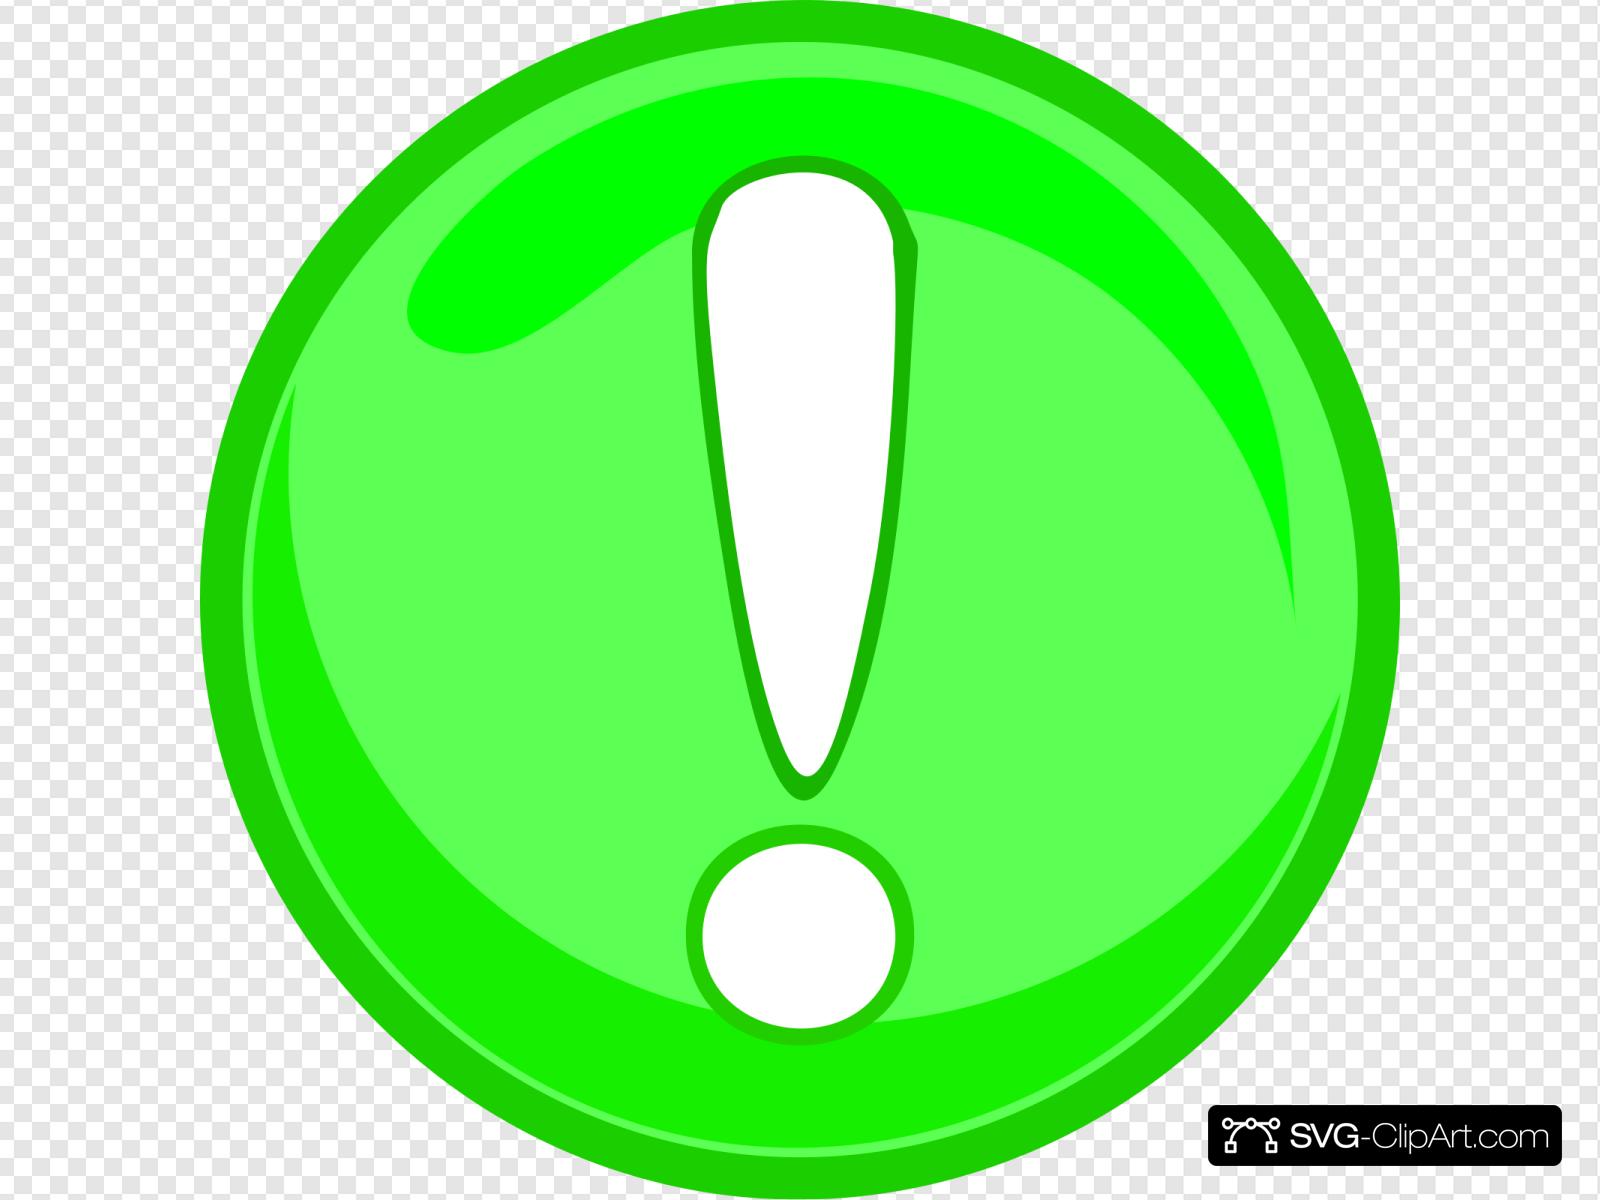 Green Caution Icon Clip art, Icon and SVG.